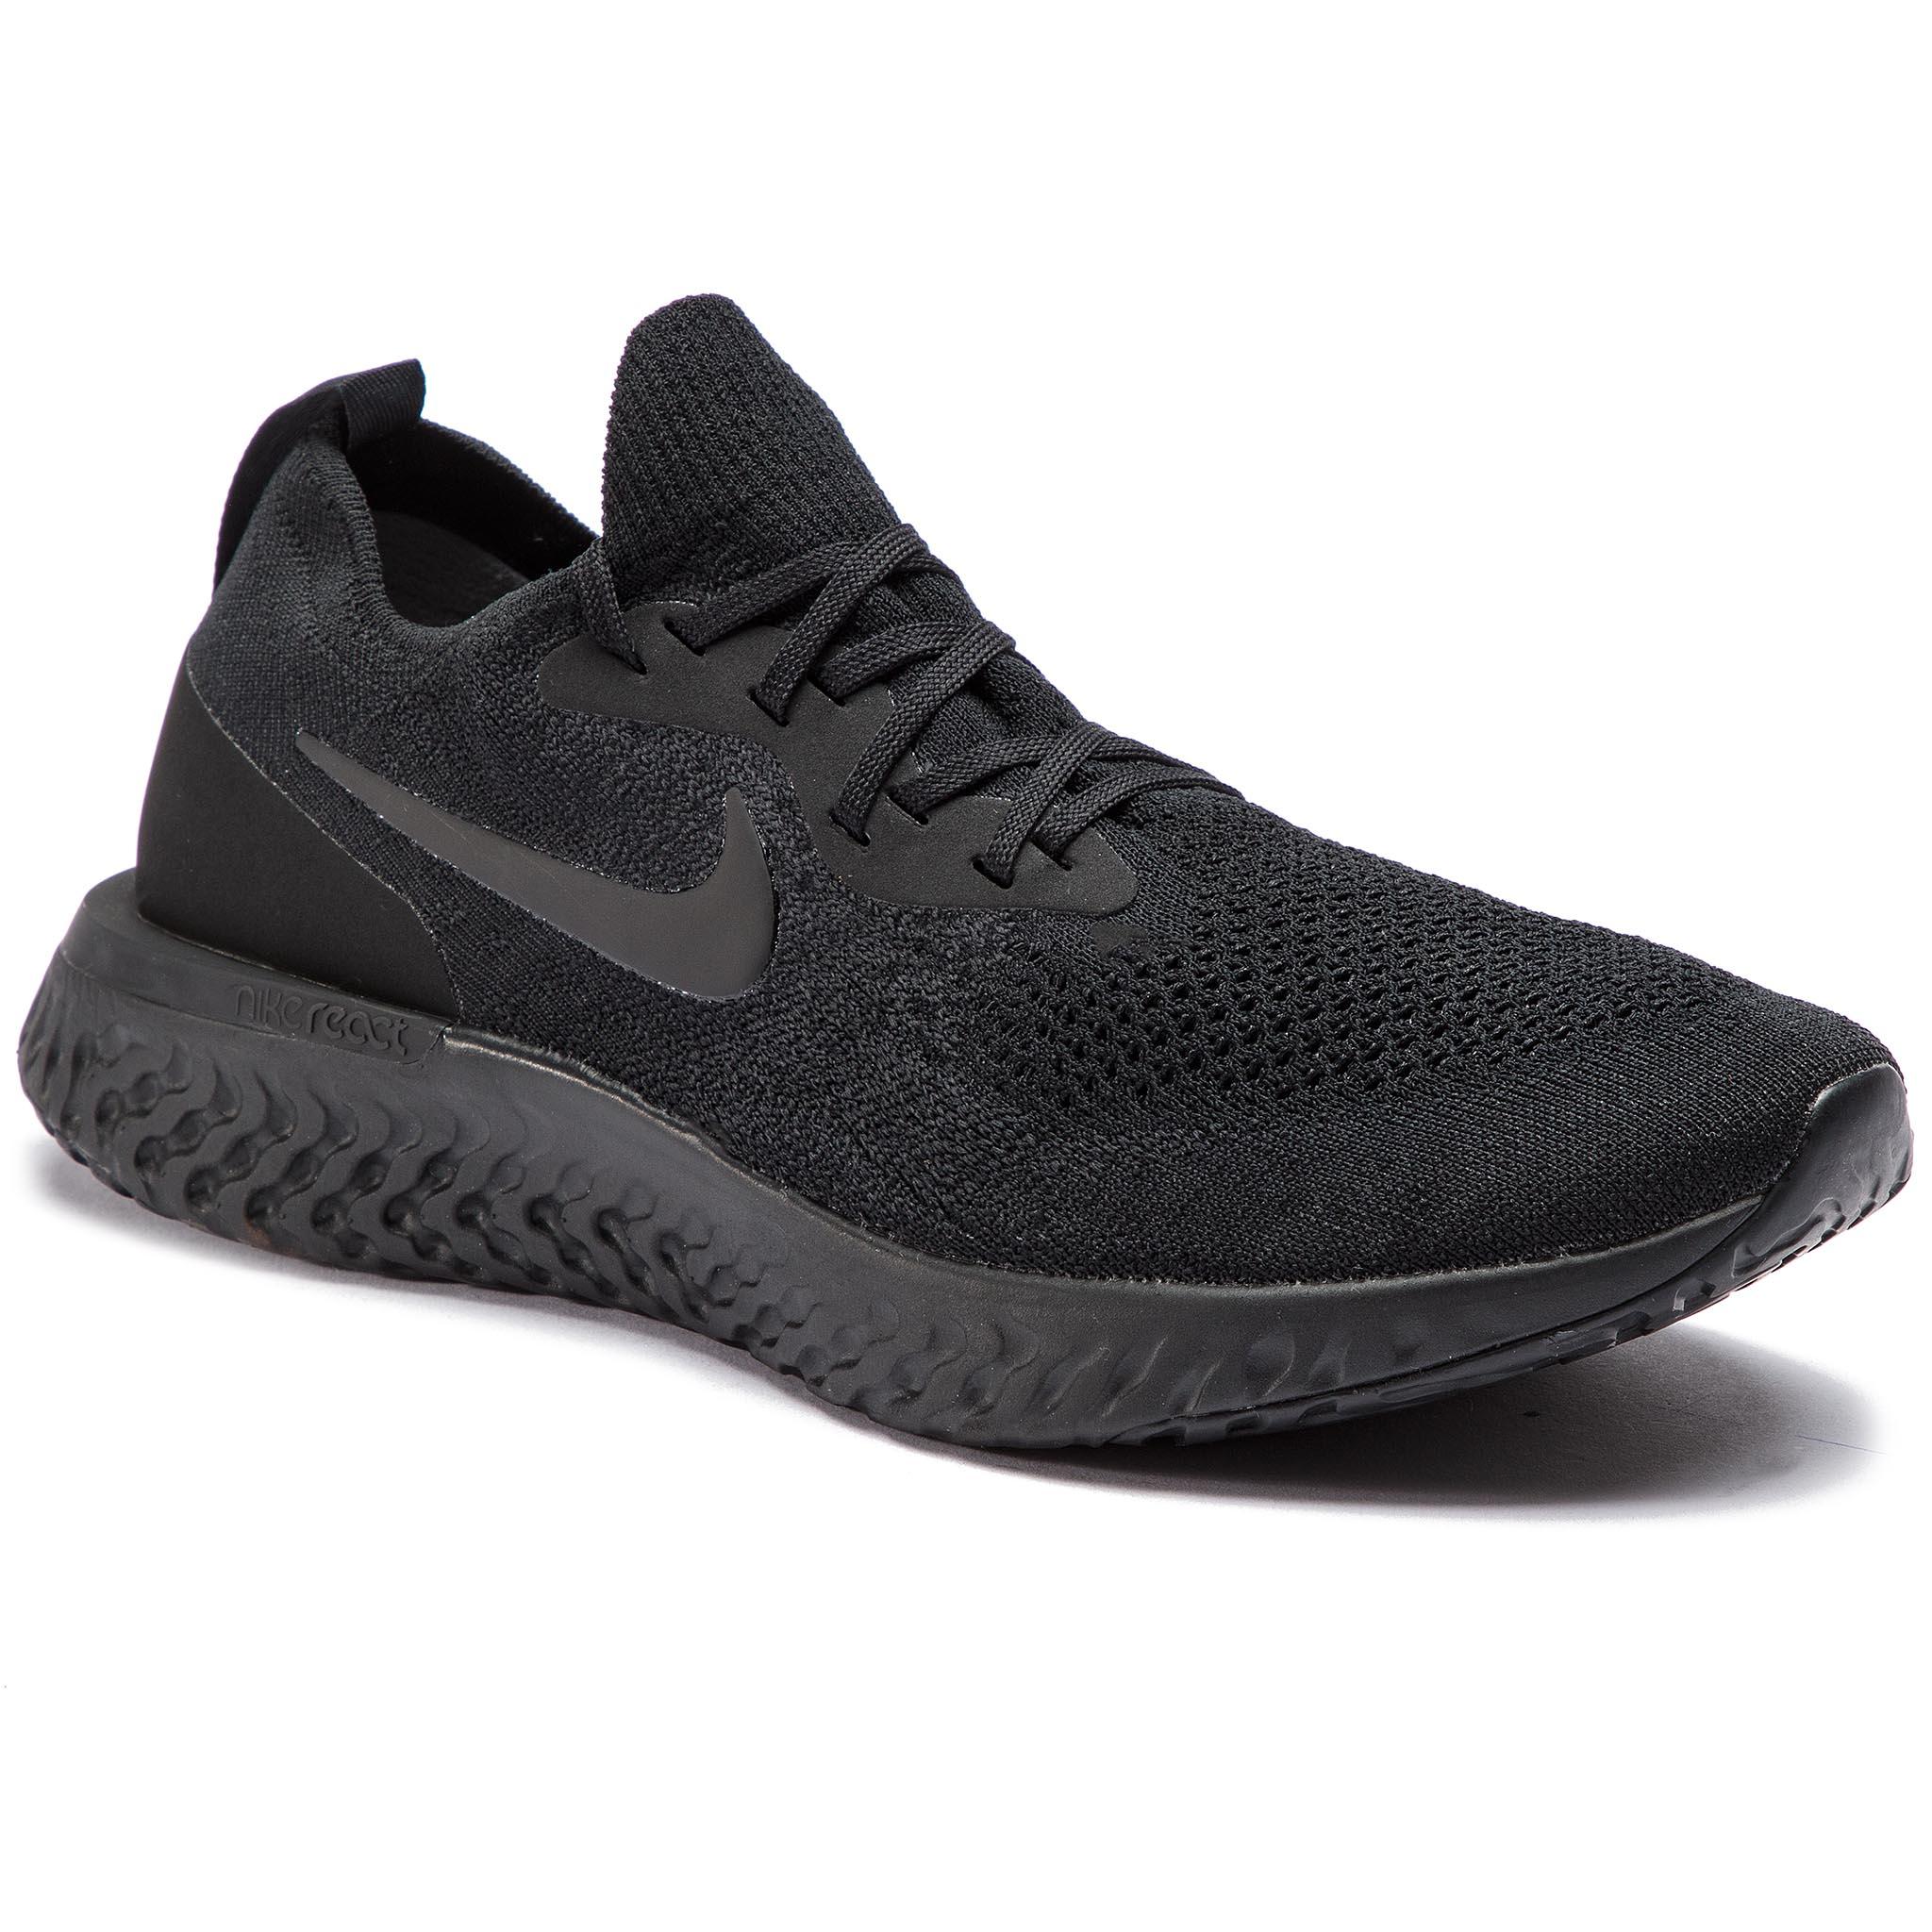 b9b9a52c1891 Shoes NIKE - Odyssey React AO9819 200 Medium Olive Black Sequoia ...